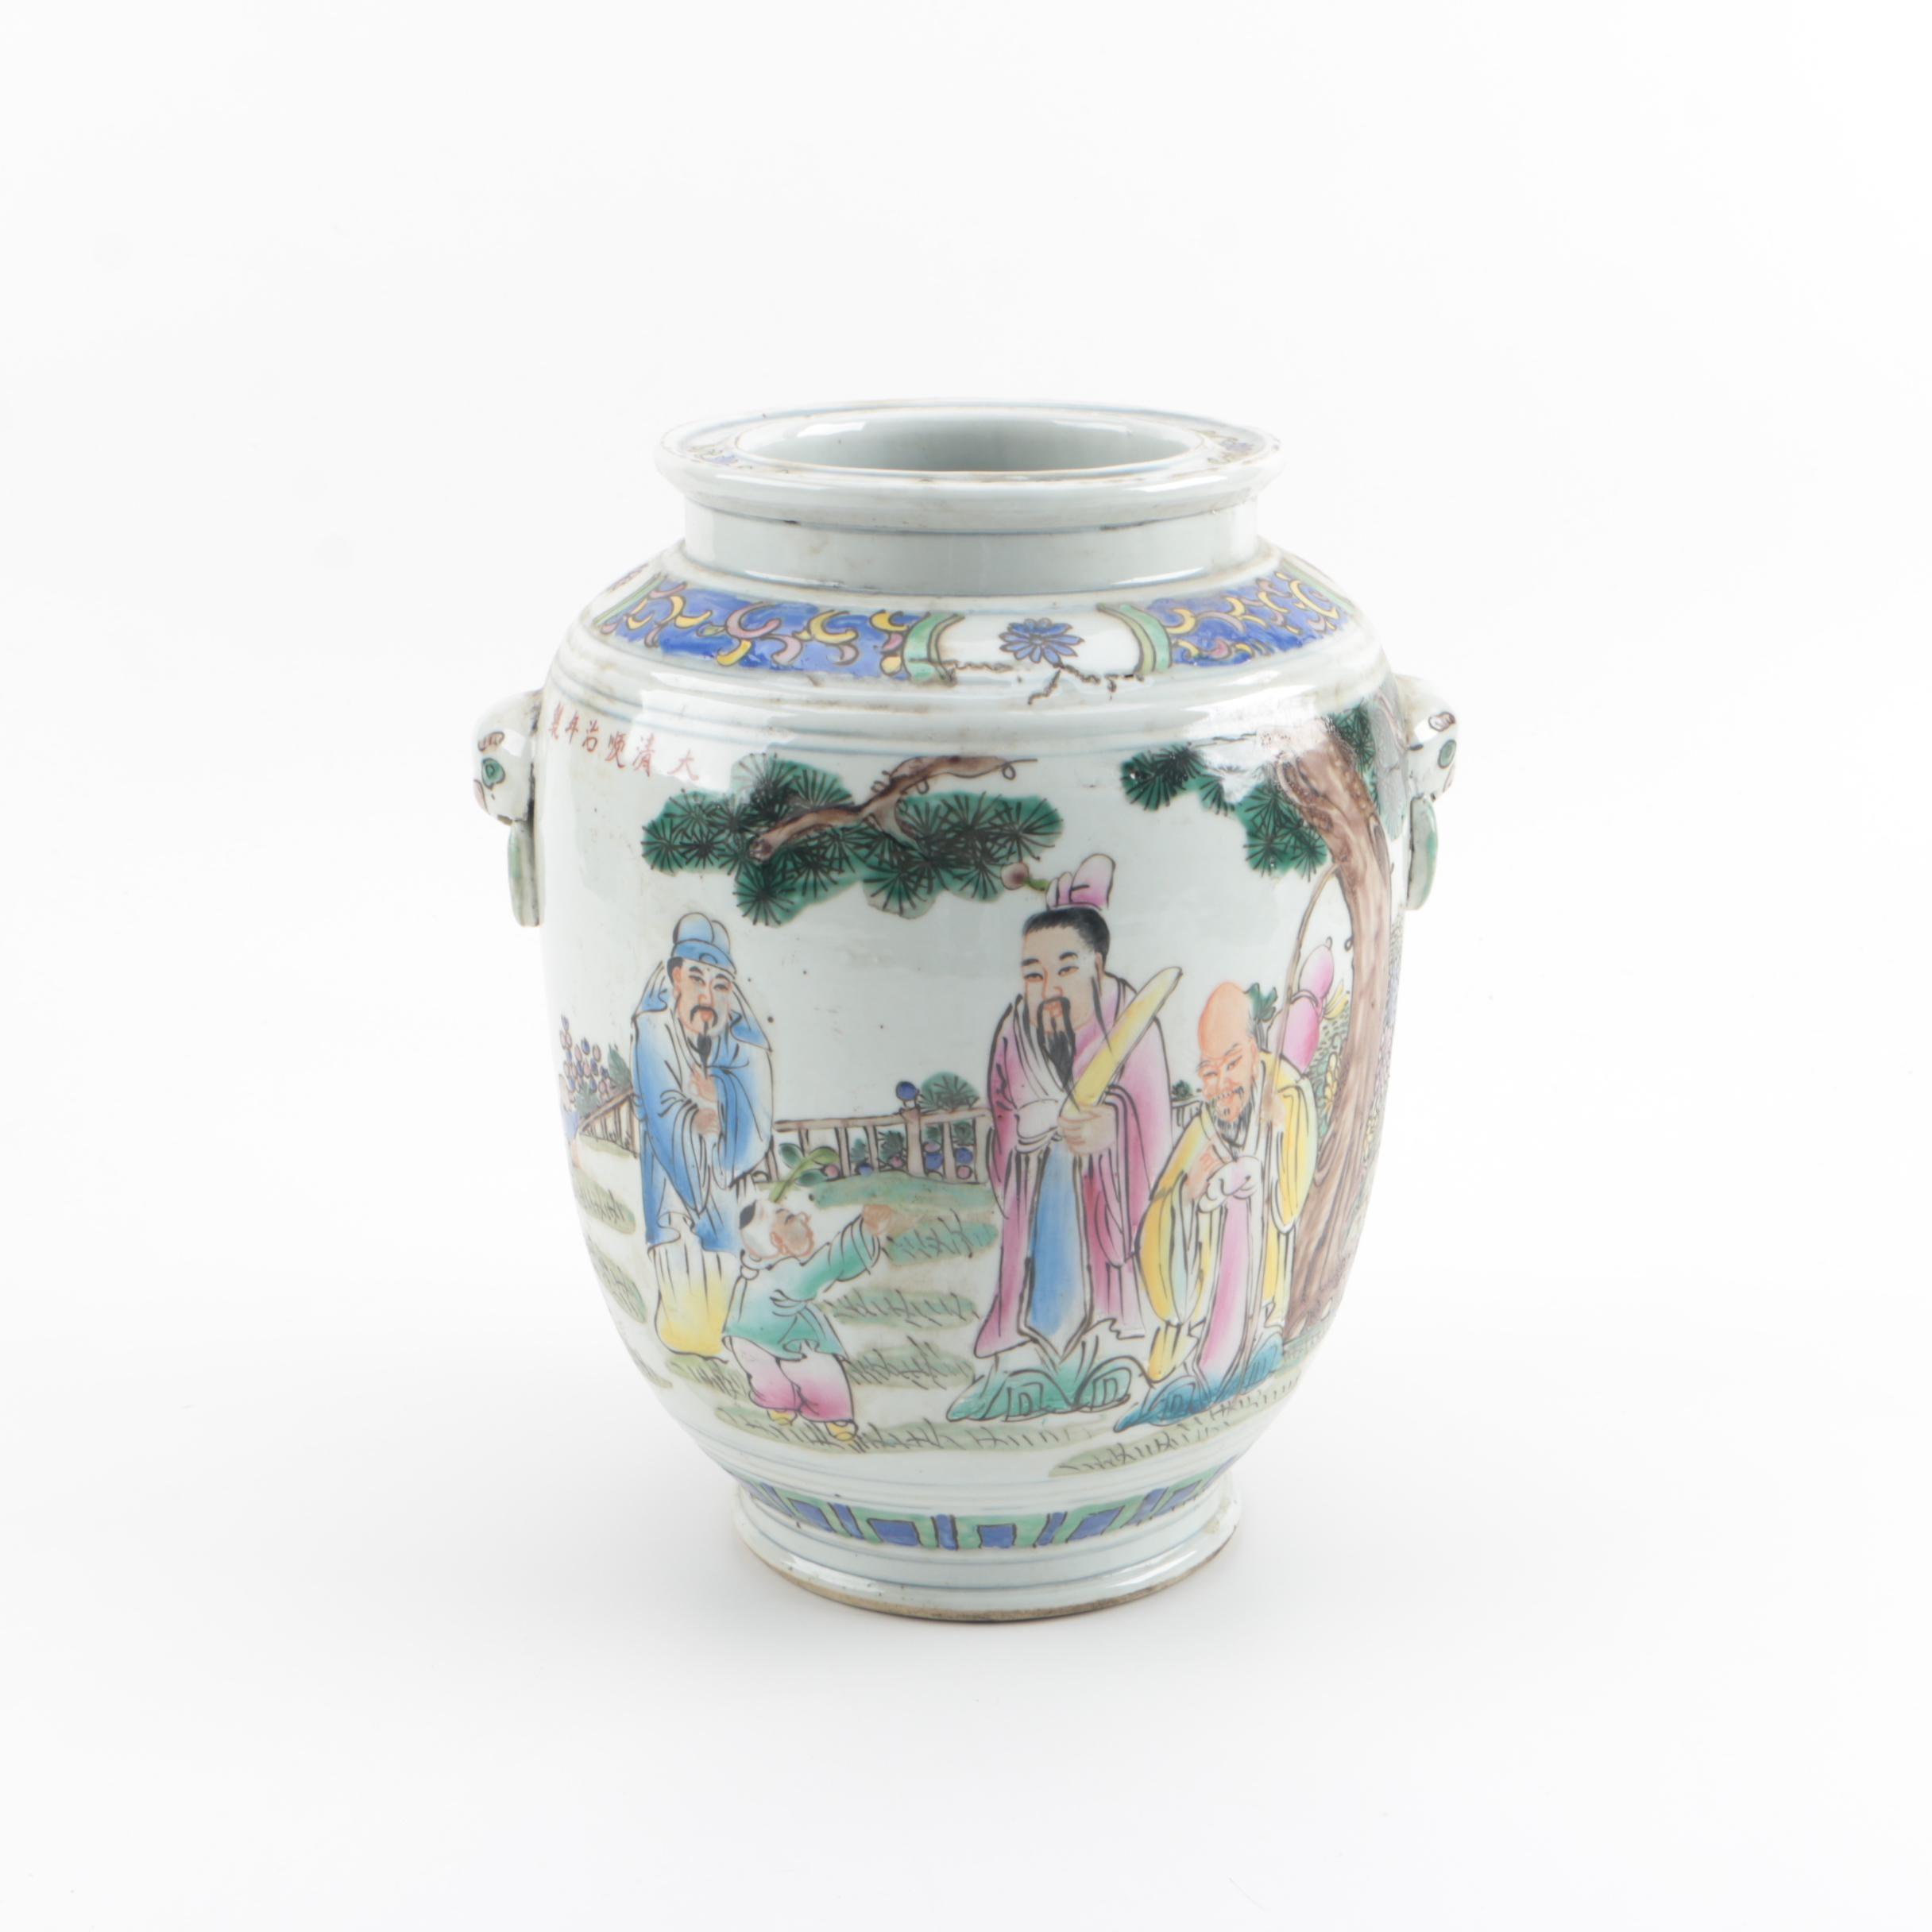 Chinese Ceramic Vase Depicting Men in Robes